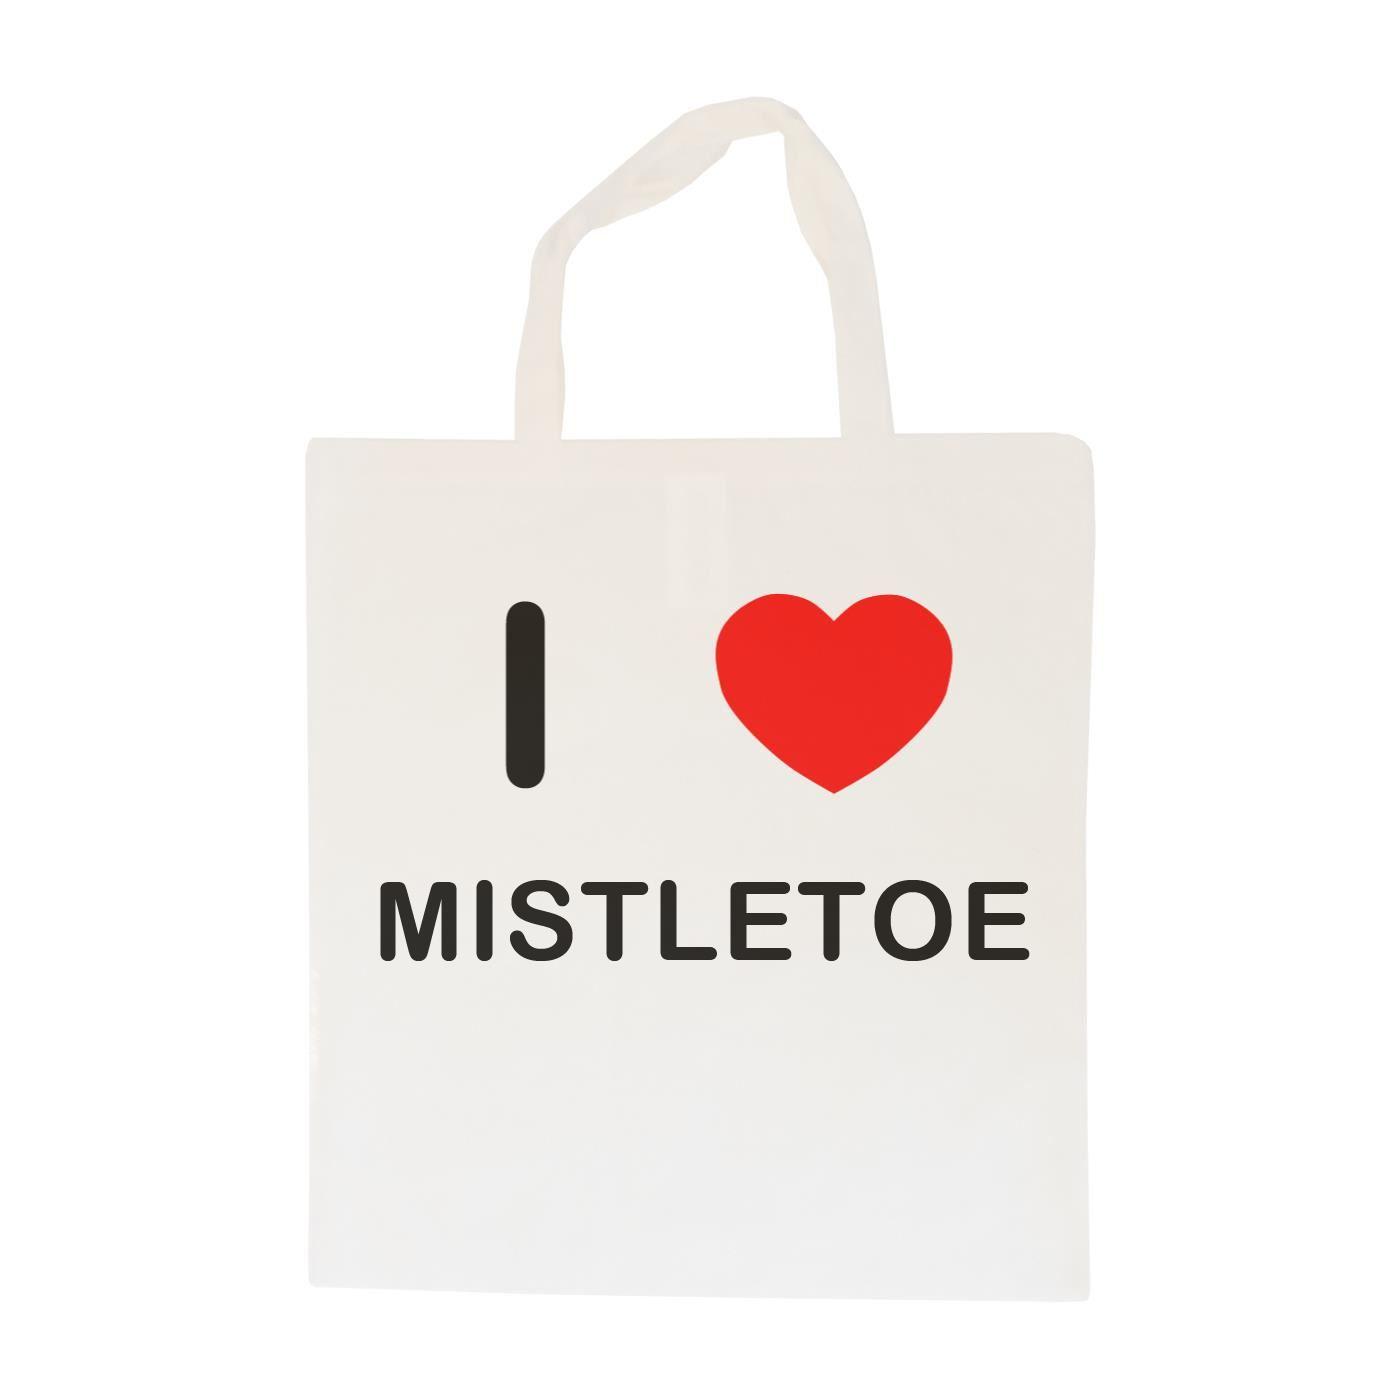 I Love Mistletoe - Cotton Bag | Size choice Tote, Shopper or Sling